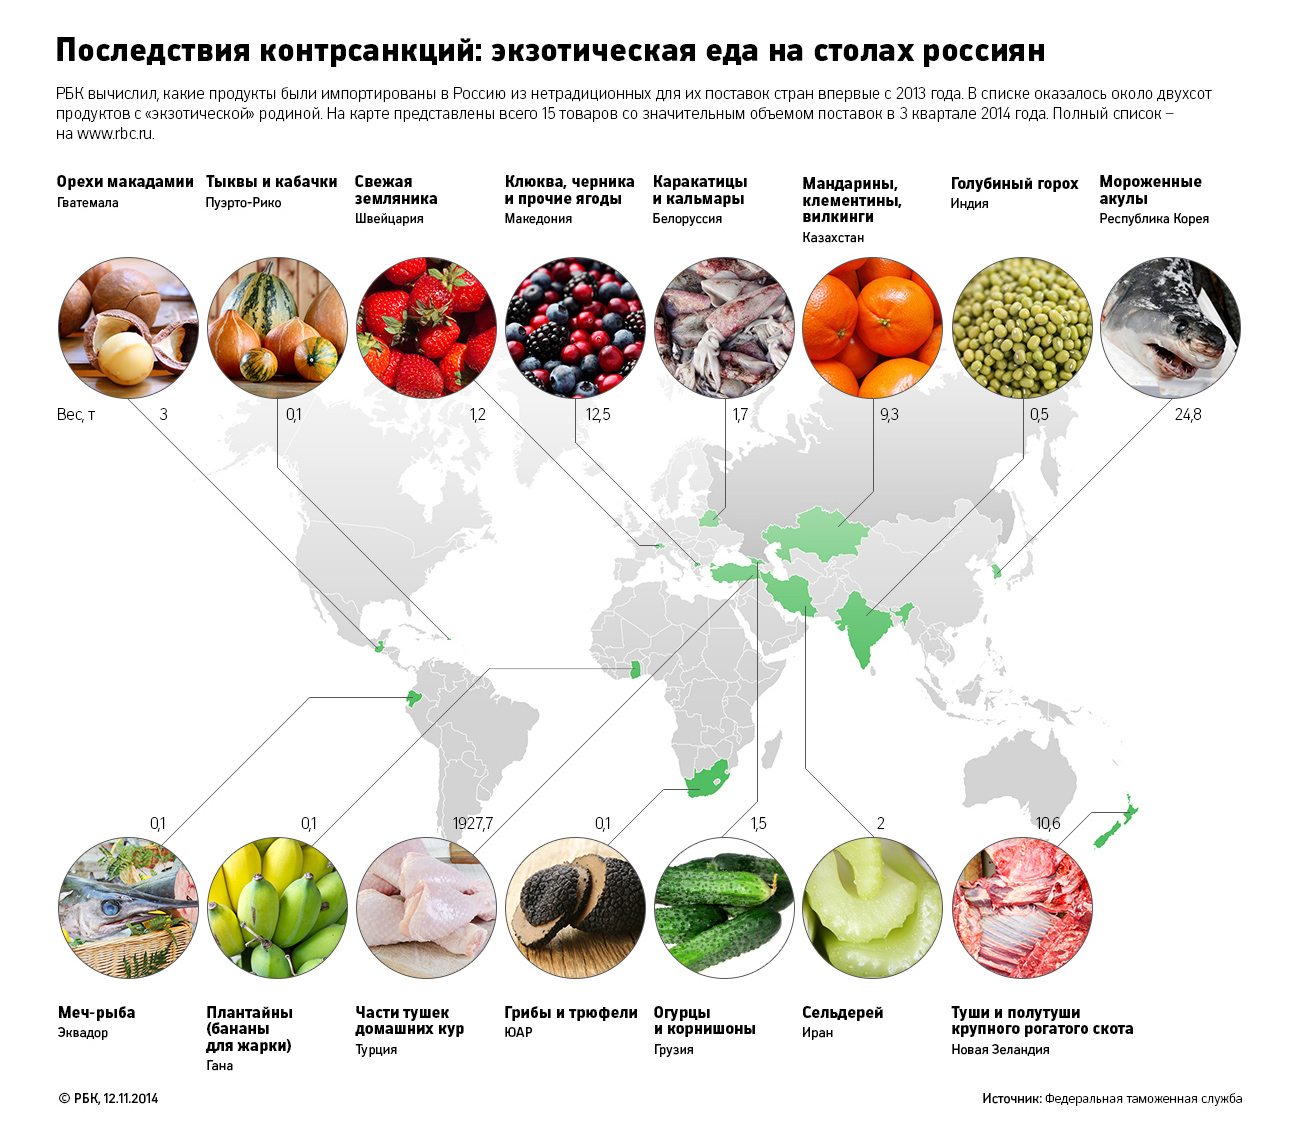 http://pics.v6.top.rbc.ru/v6_top_pics/media/img/1/49/284158397125491.jpg